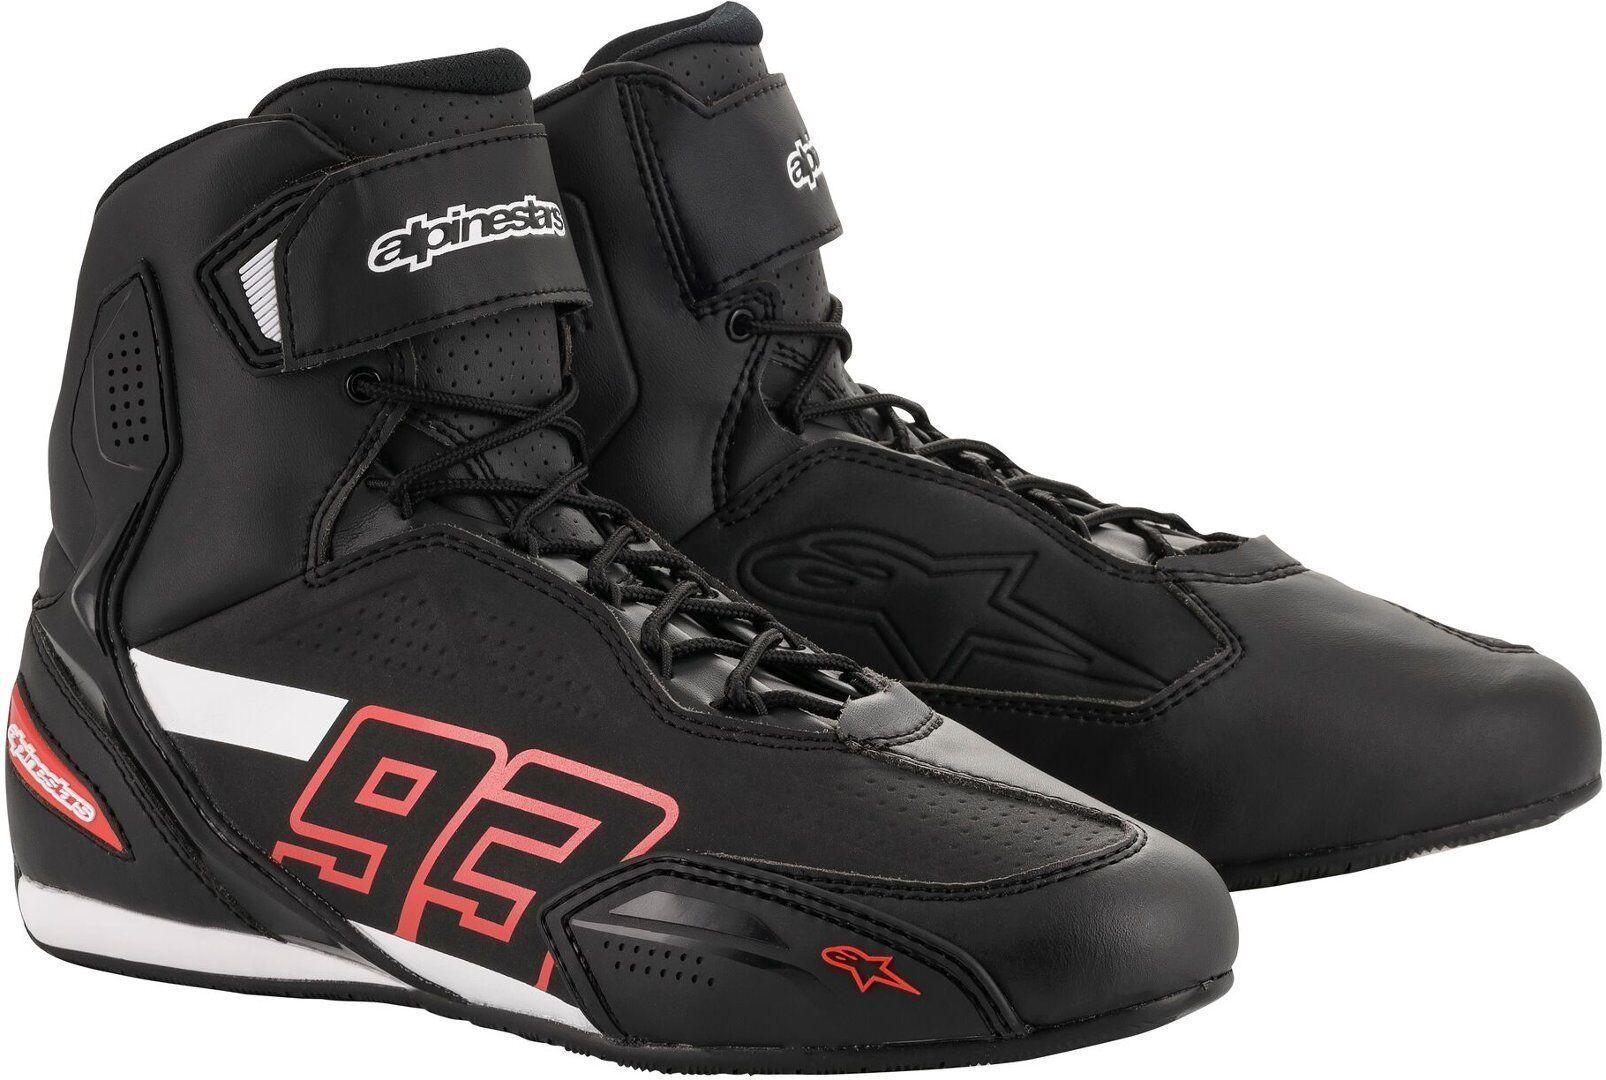 Alpinestars MM93 Austin Motorcycle Shoes Black Red 47